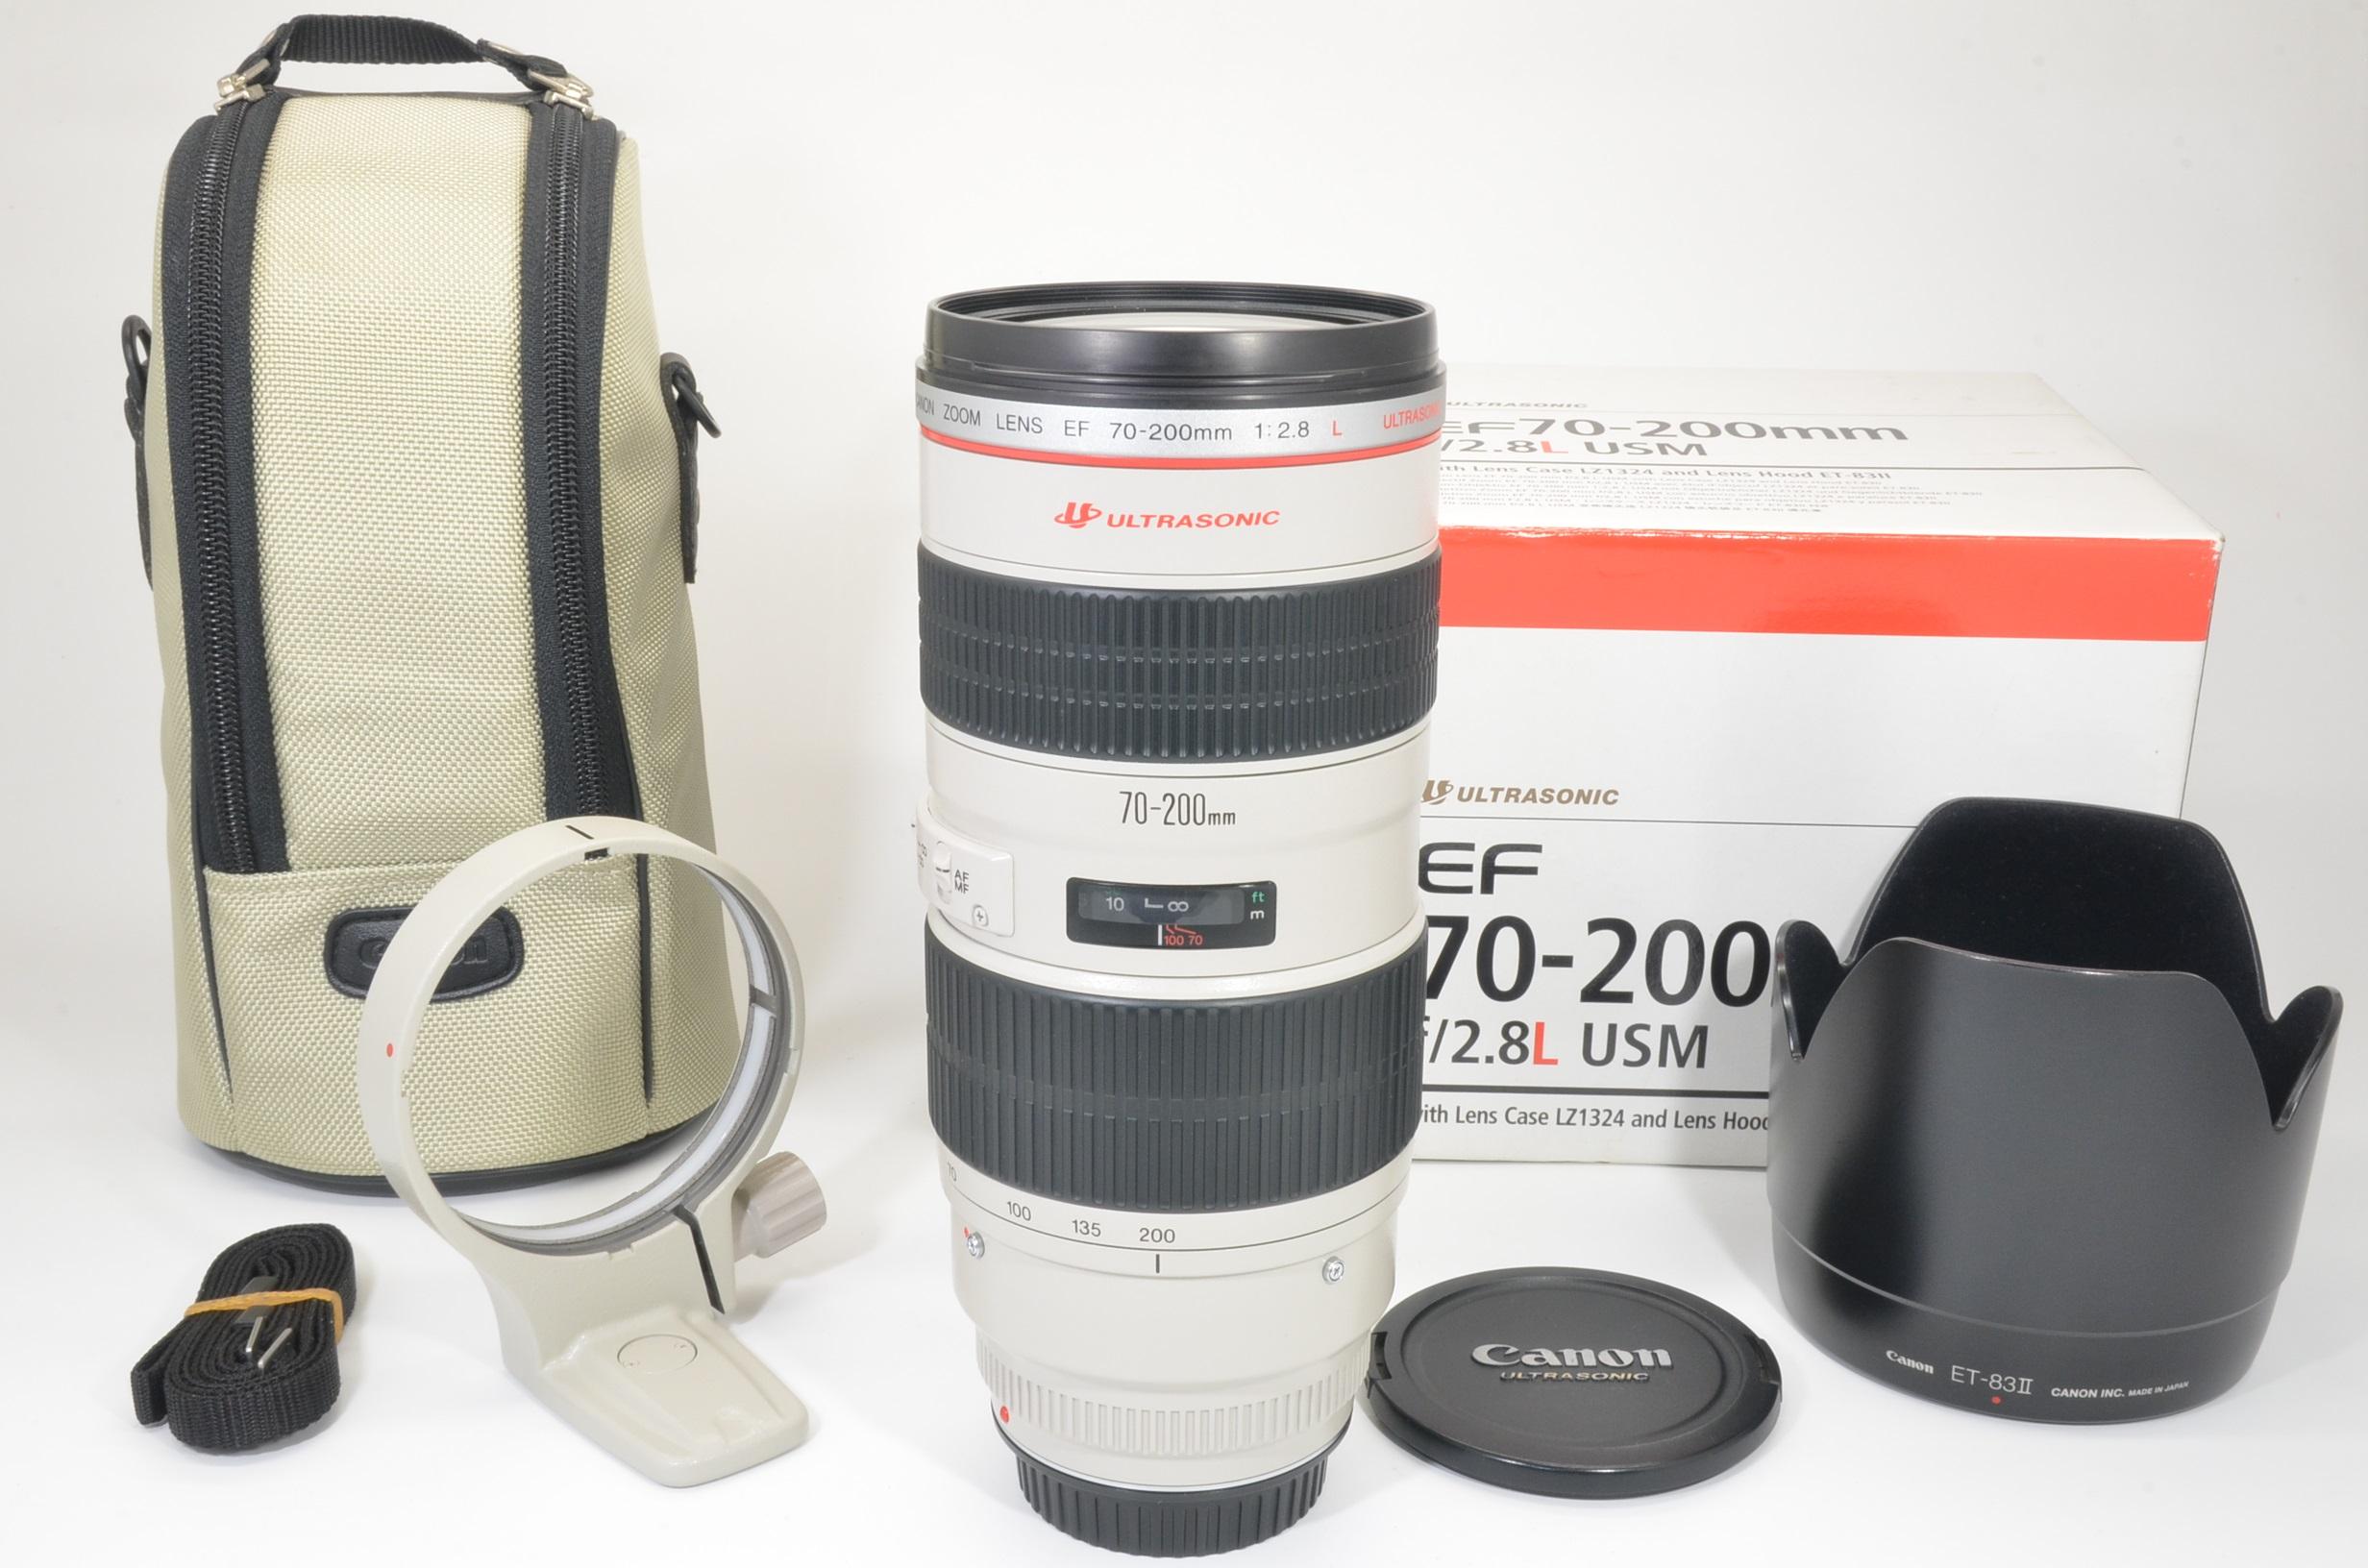 canon ef 70-200mm f/2.8 l usm ultrasonic lens   shooting tested